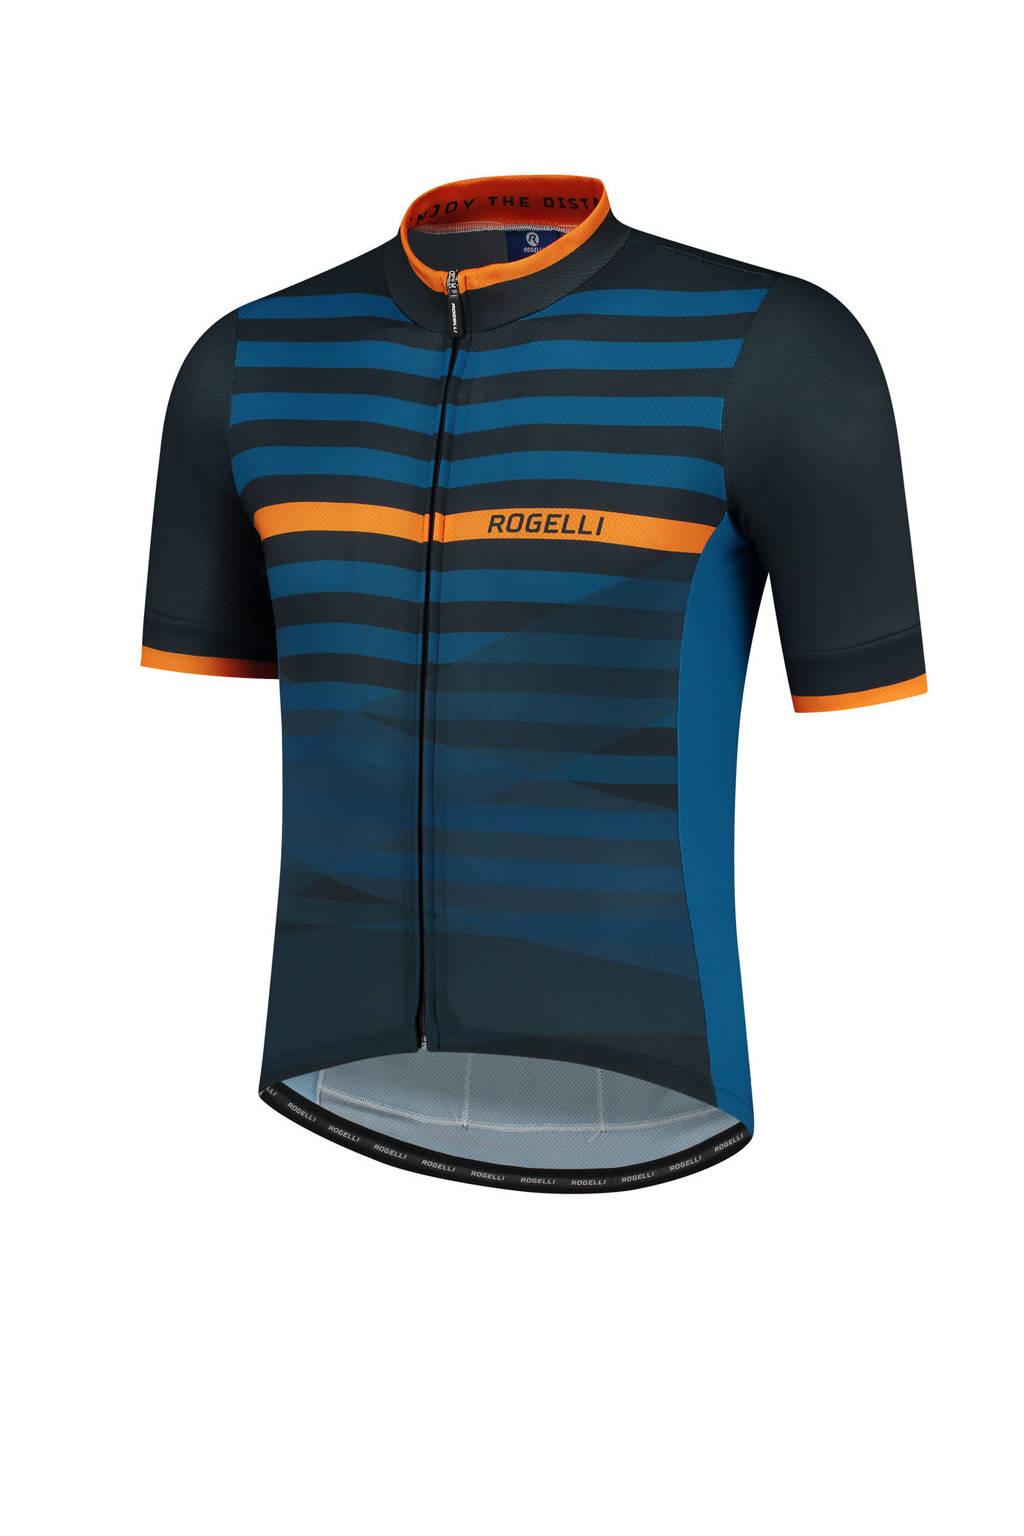 Rogelli   fietsshirt Stripe blauw/oranje, Blauw/oranje